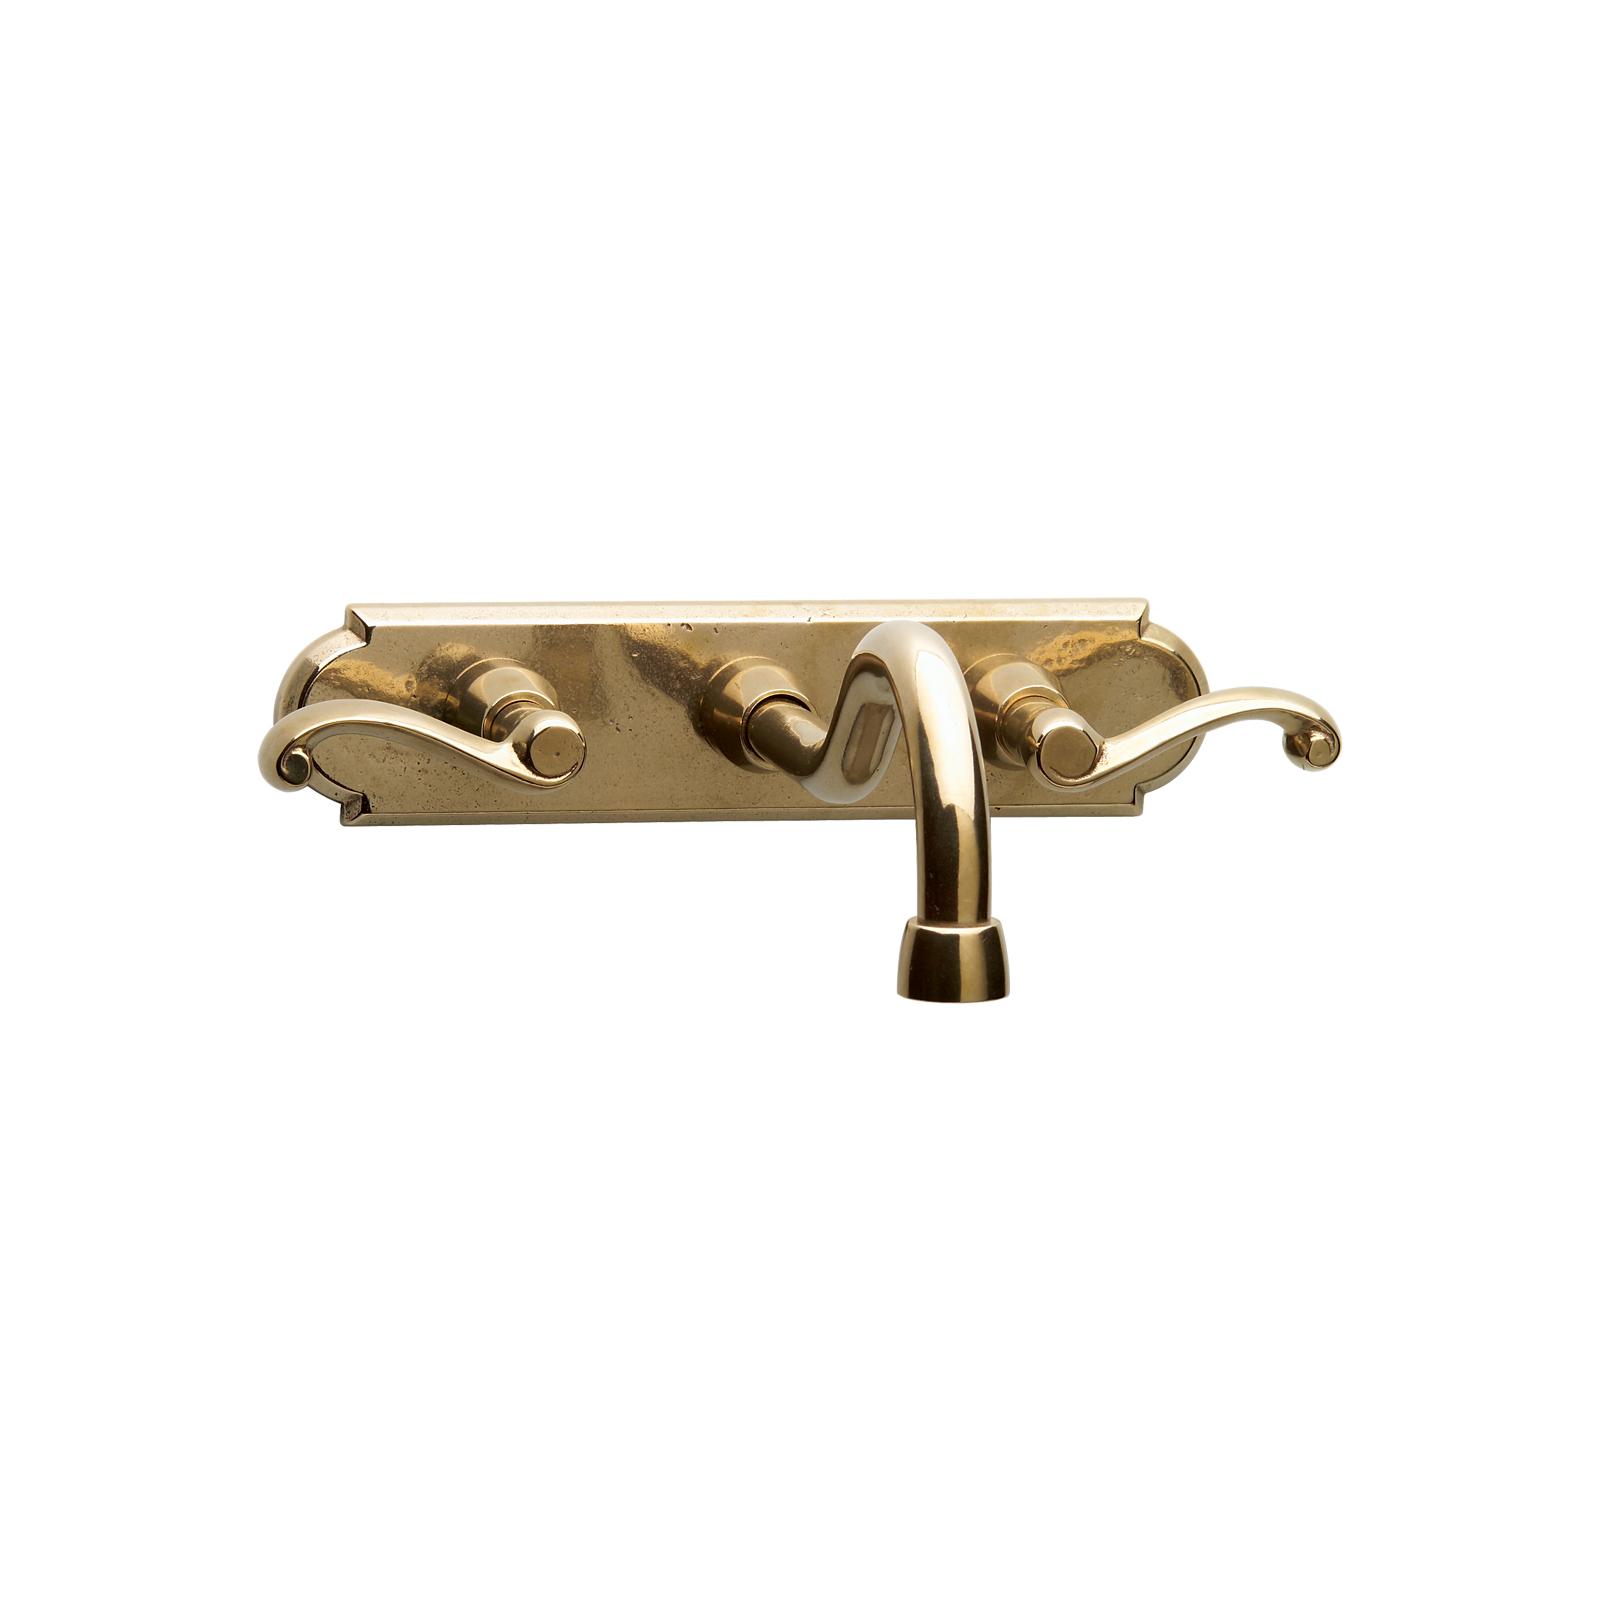 Wall Mount Faucet With Rectangular Escutcheon - design idea